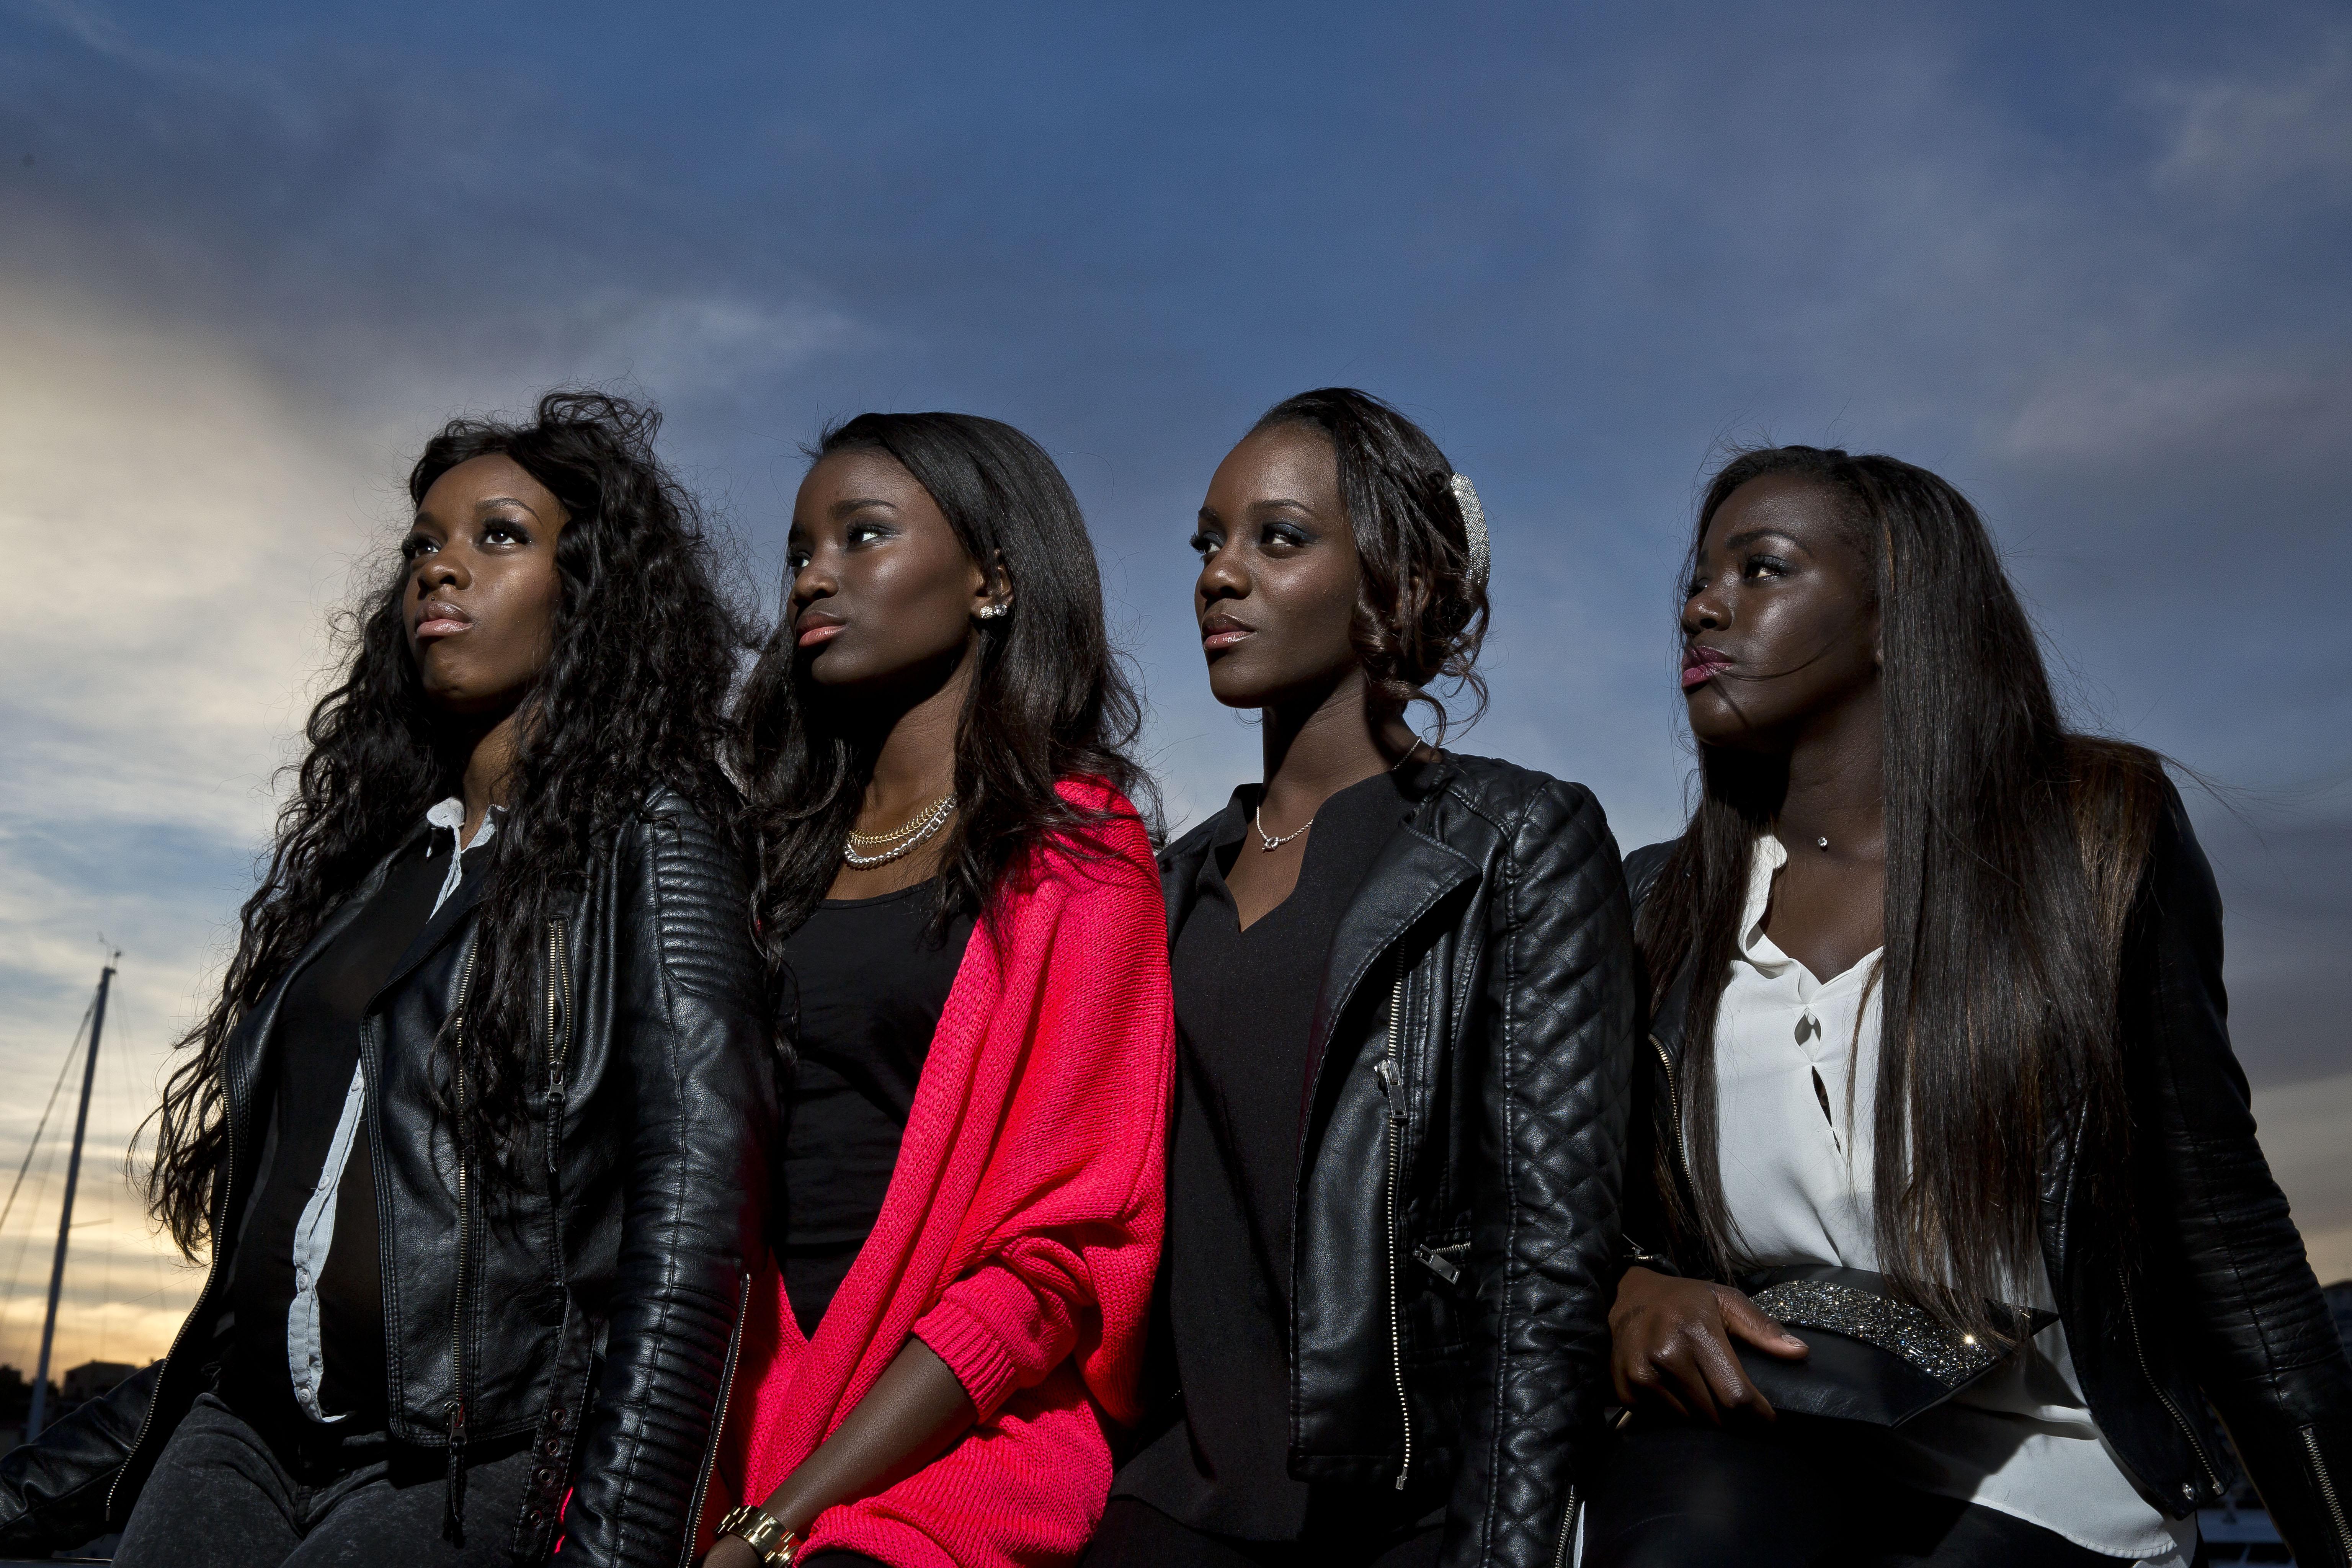 De gauche à droite : Marietou Toure, Karidja Toure, Assa Sylla, Lindsay Karamoh © Paul Blind